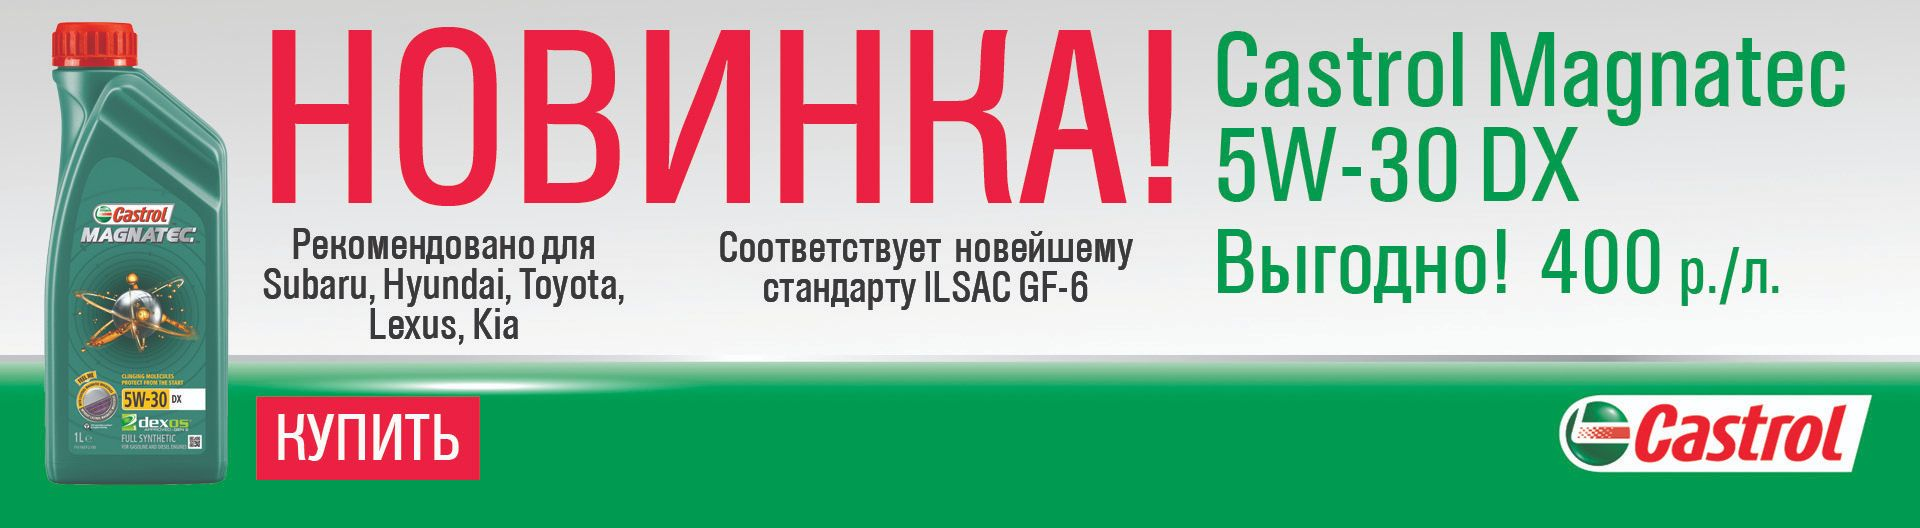 https://krascastrol.ru/dx/